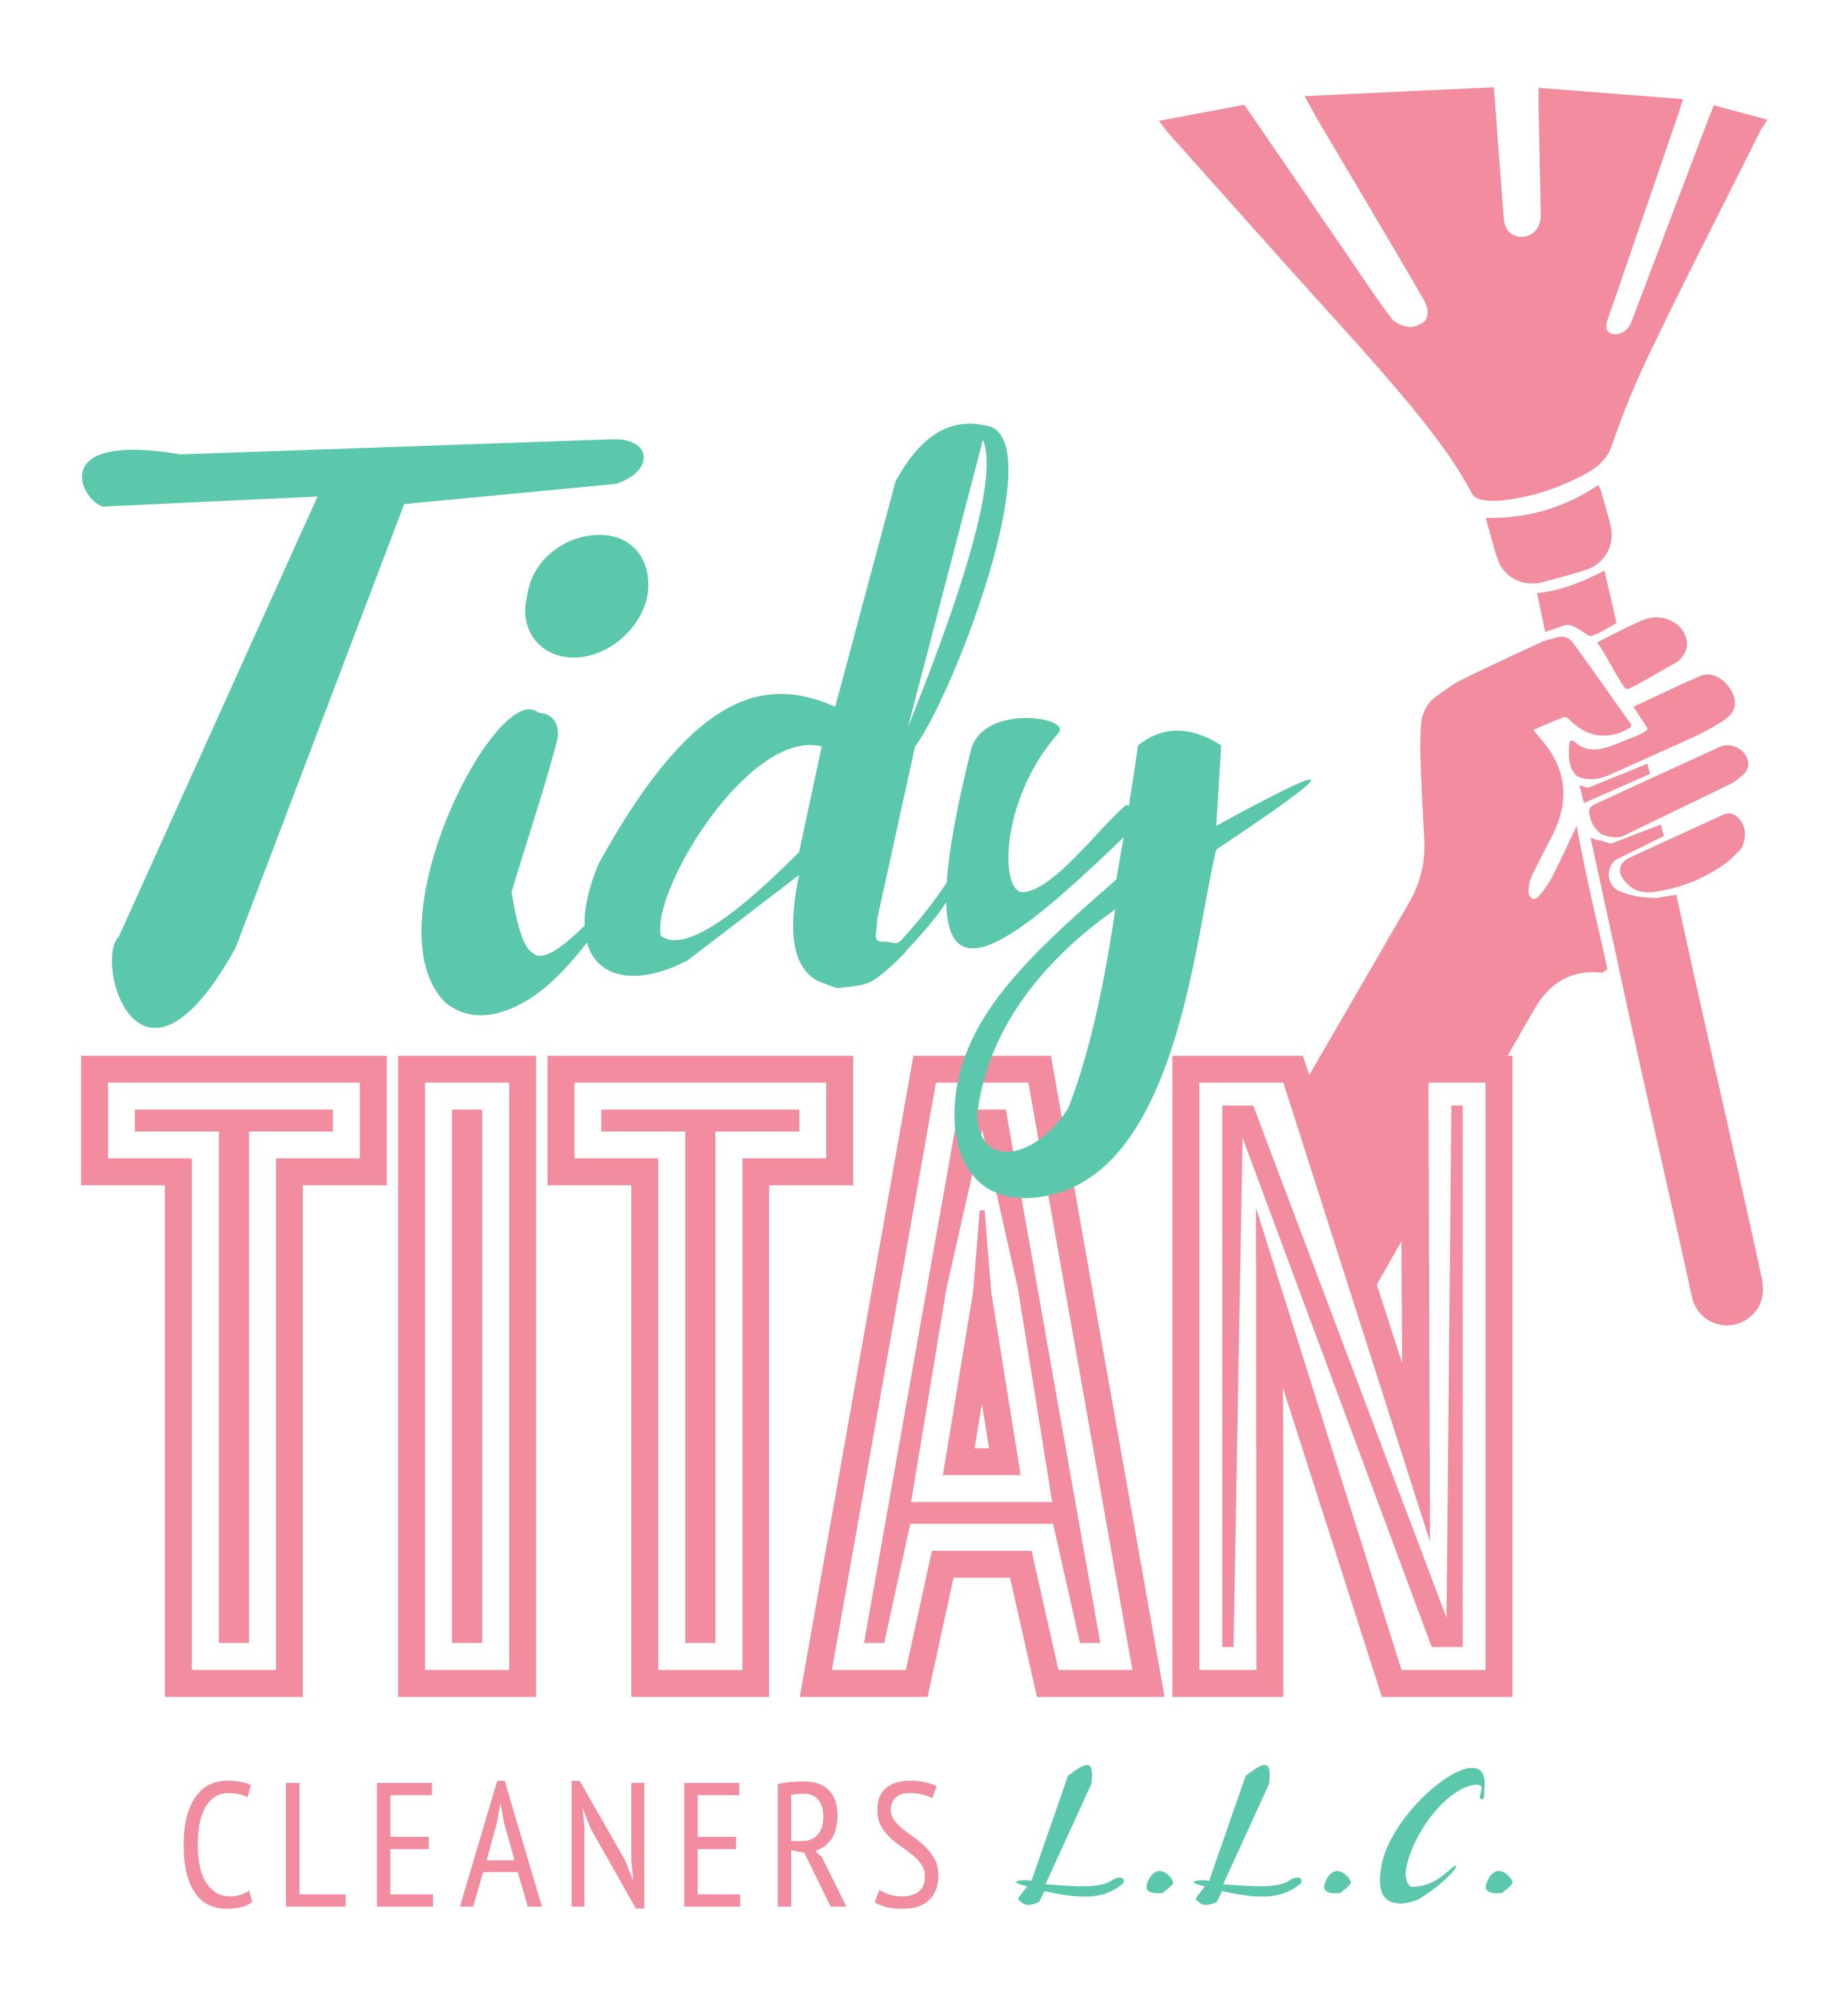 Sponsor Tidy Titan Cleaners